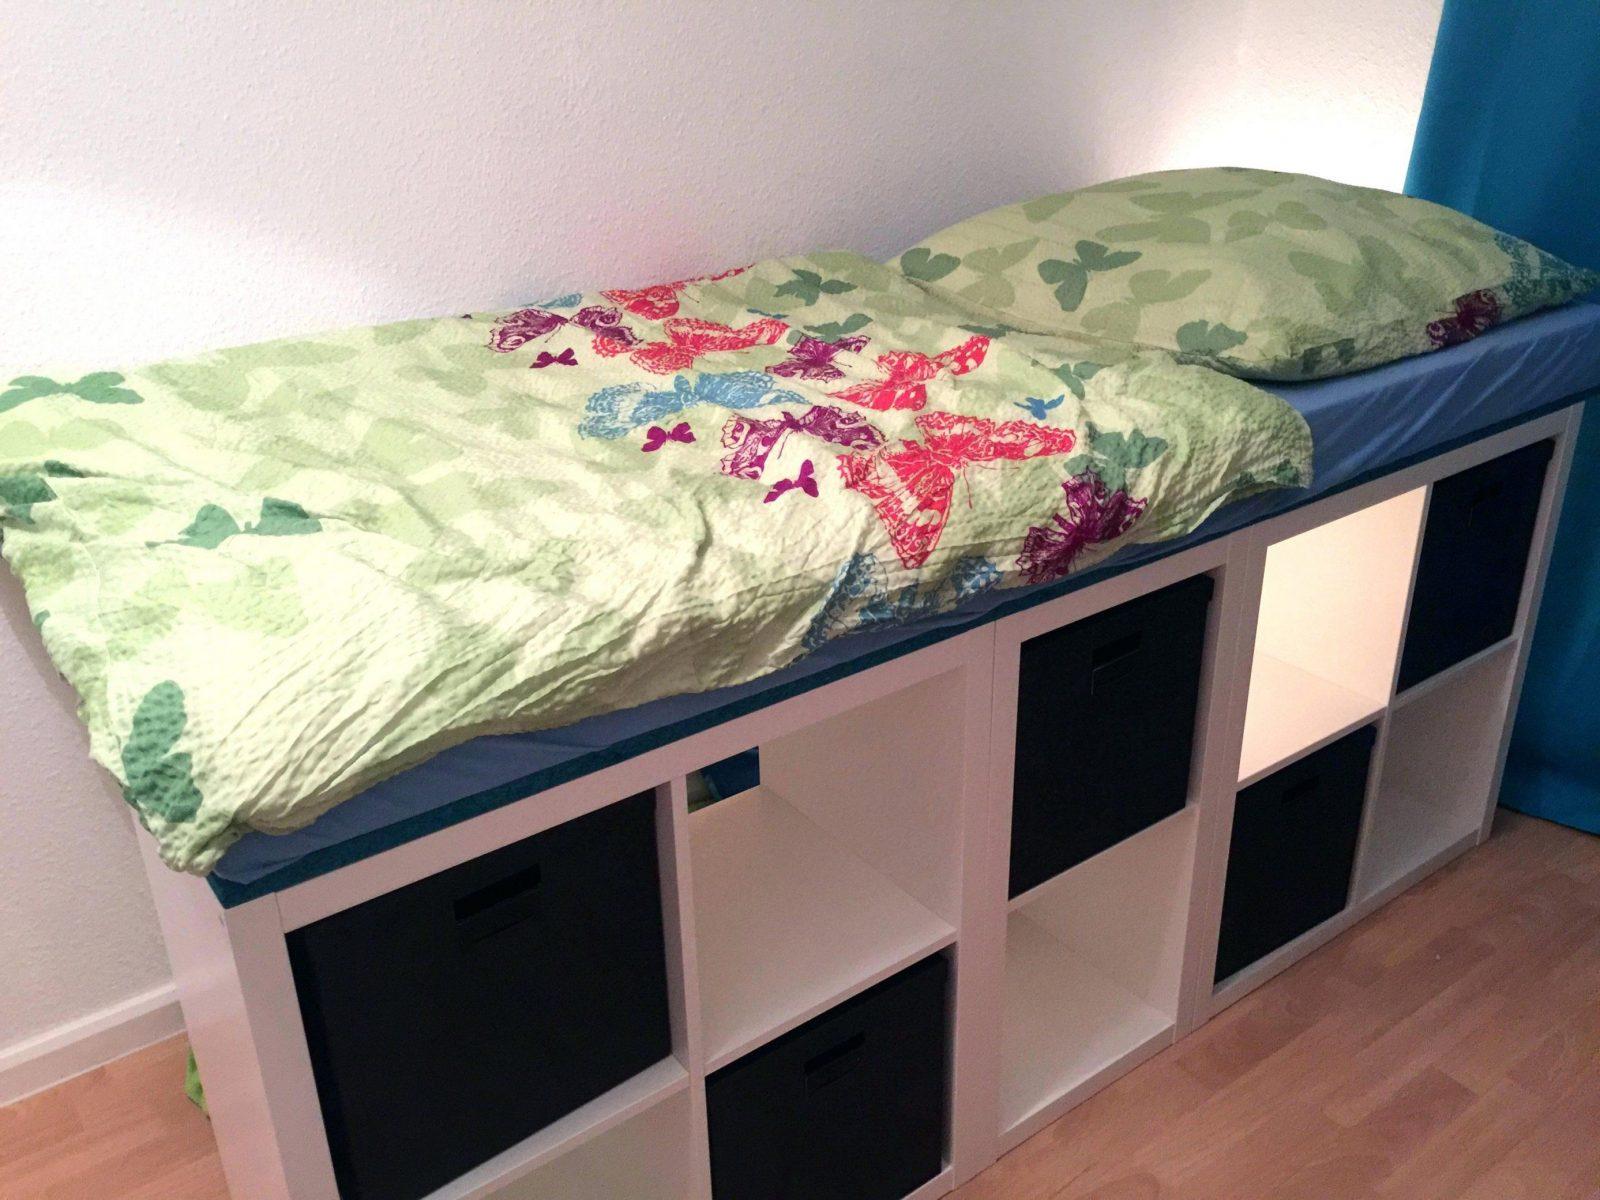 Boxspringbett Selber Zusammenstellen Bett Familienbett Kaufen von Boxspringbett Selber Zusammenstellen Bild